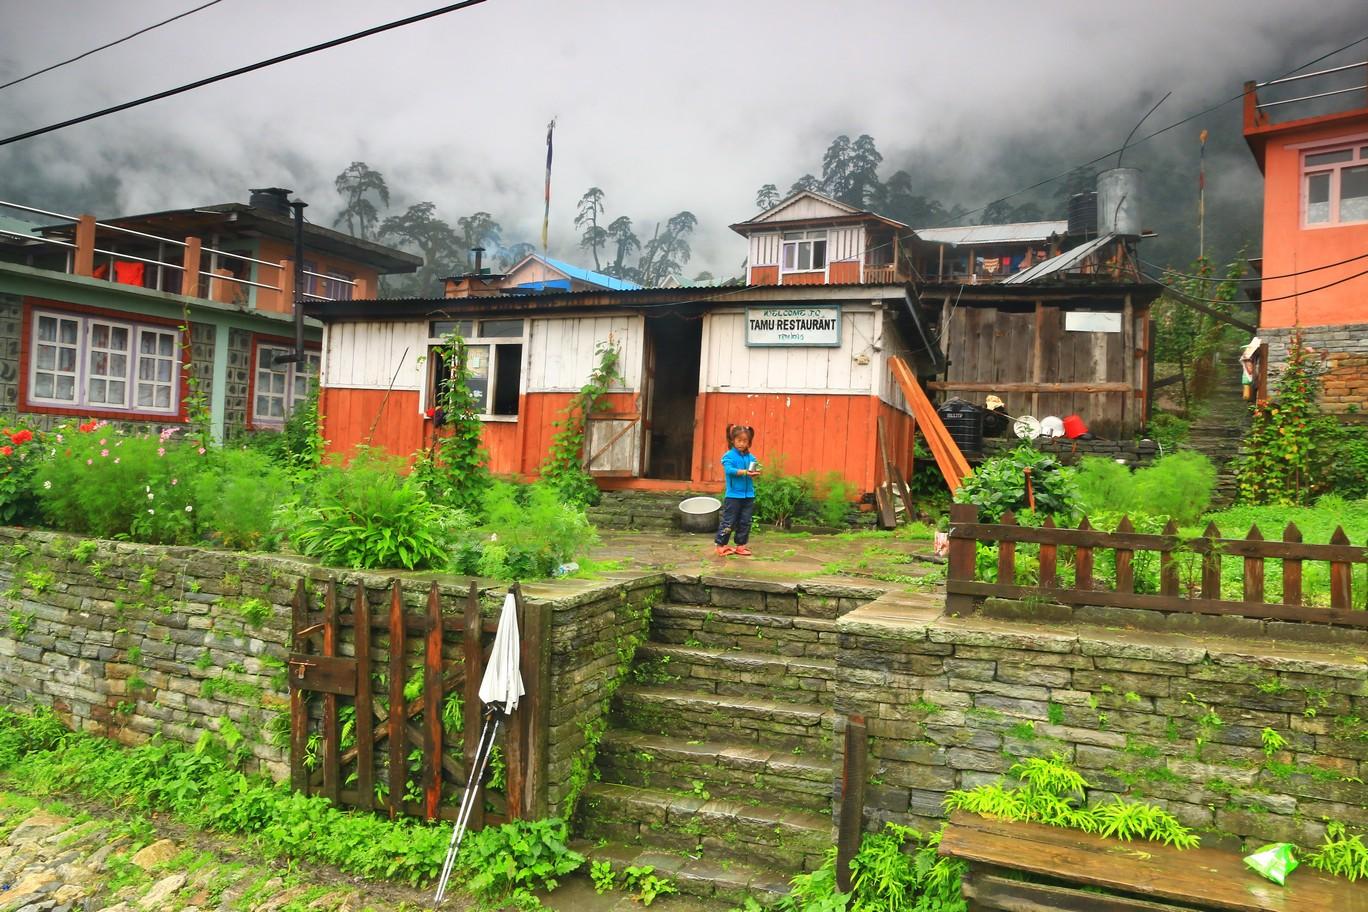 Nepal Reisebericht 2016 - www.heikosadventures.com